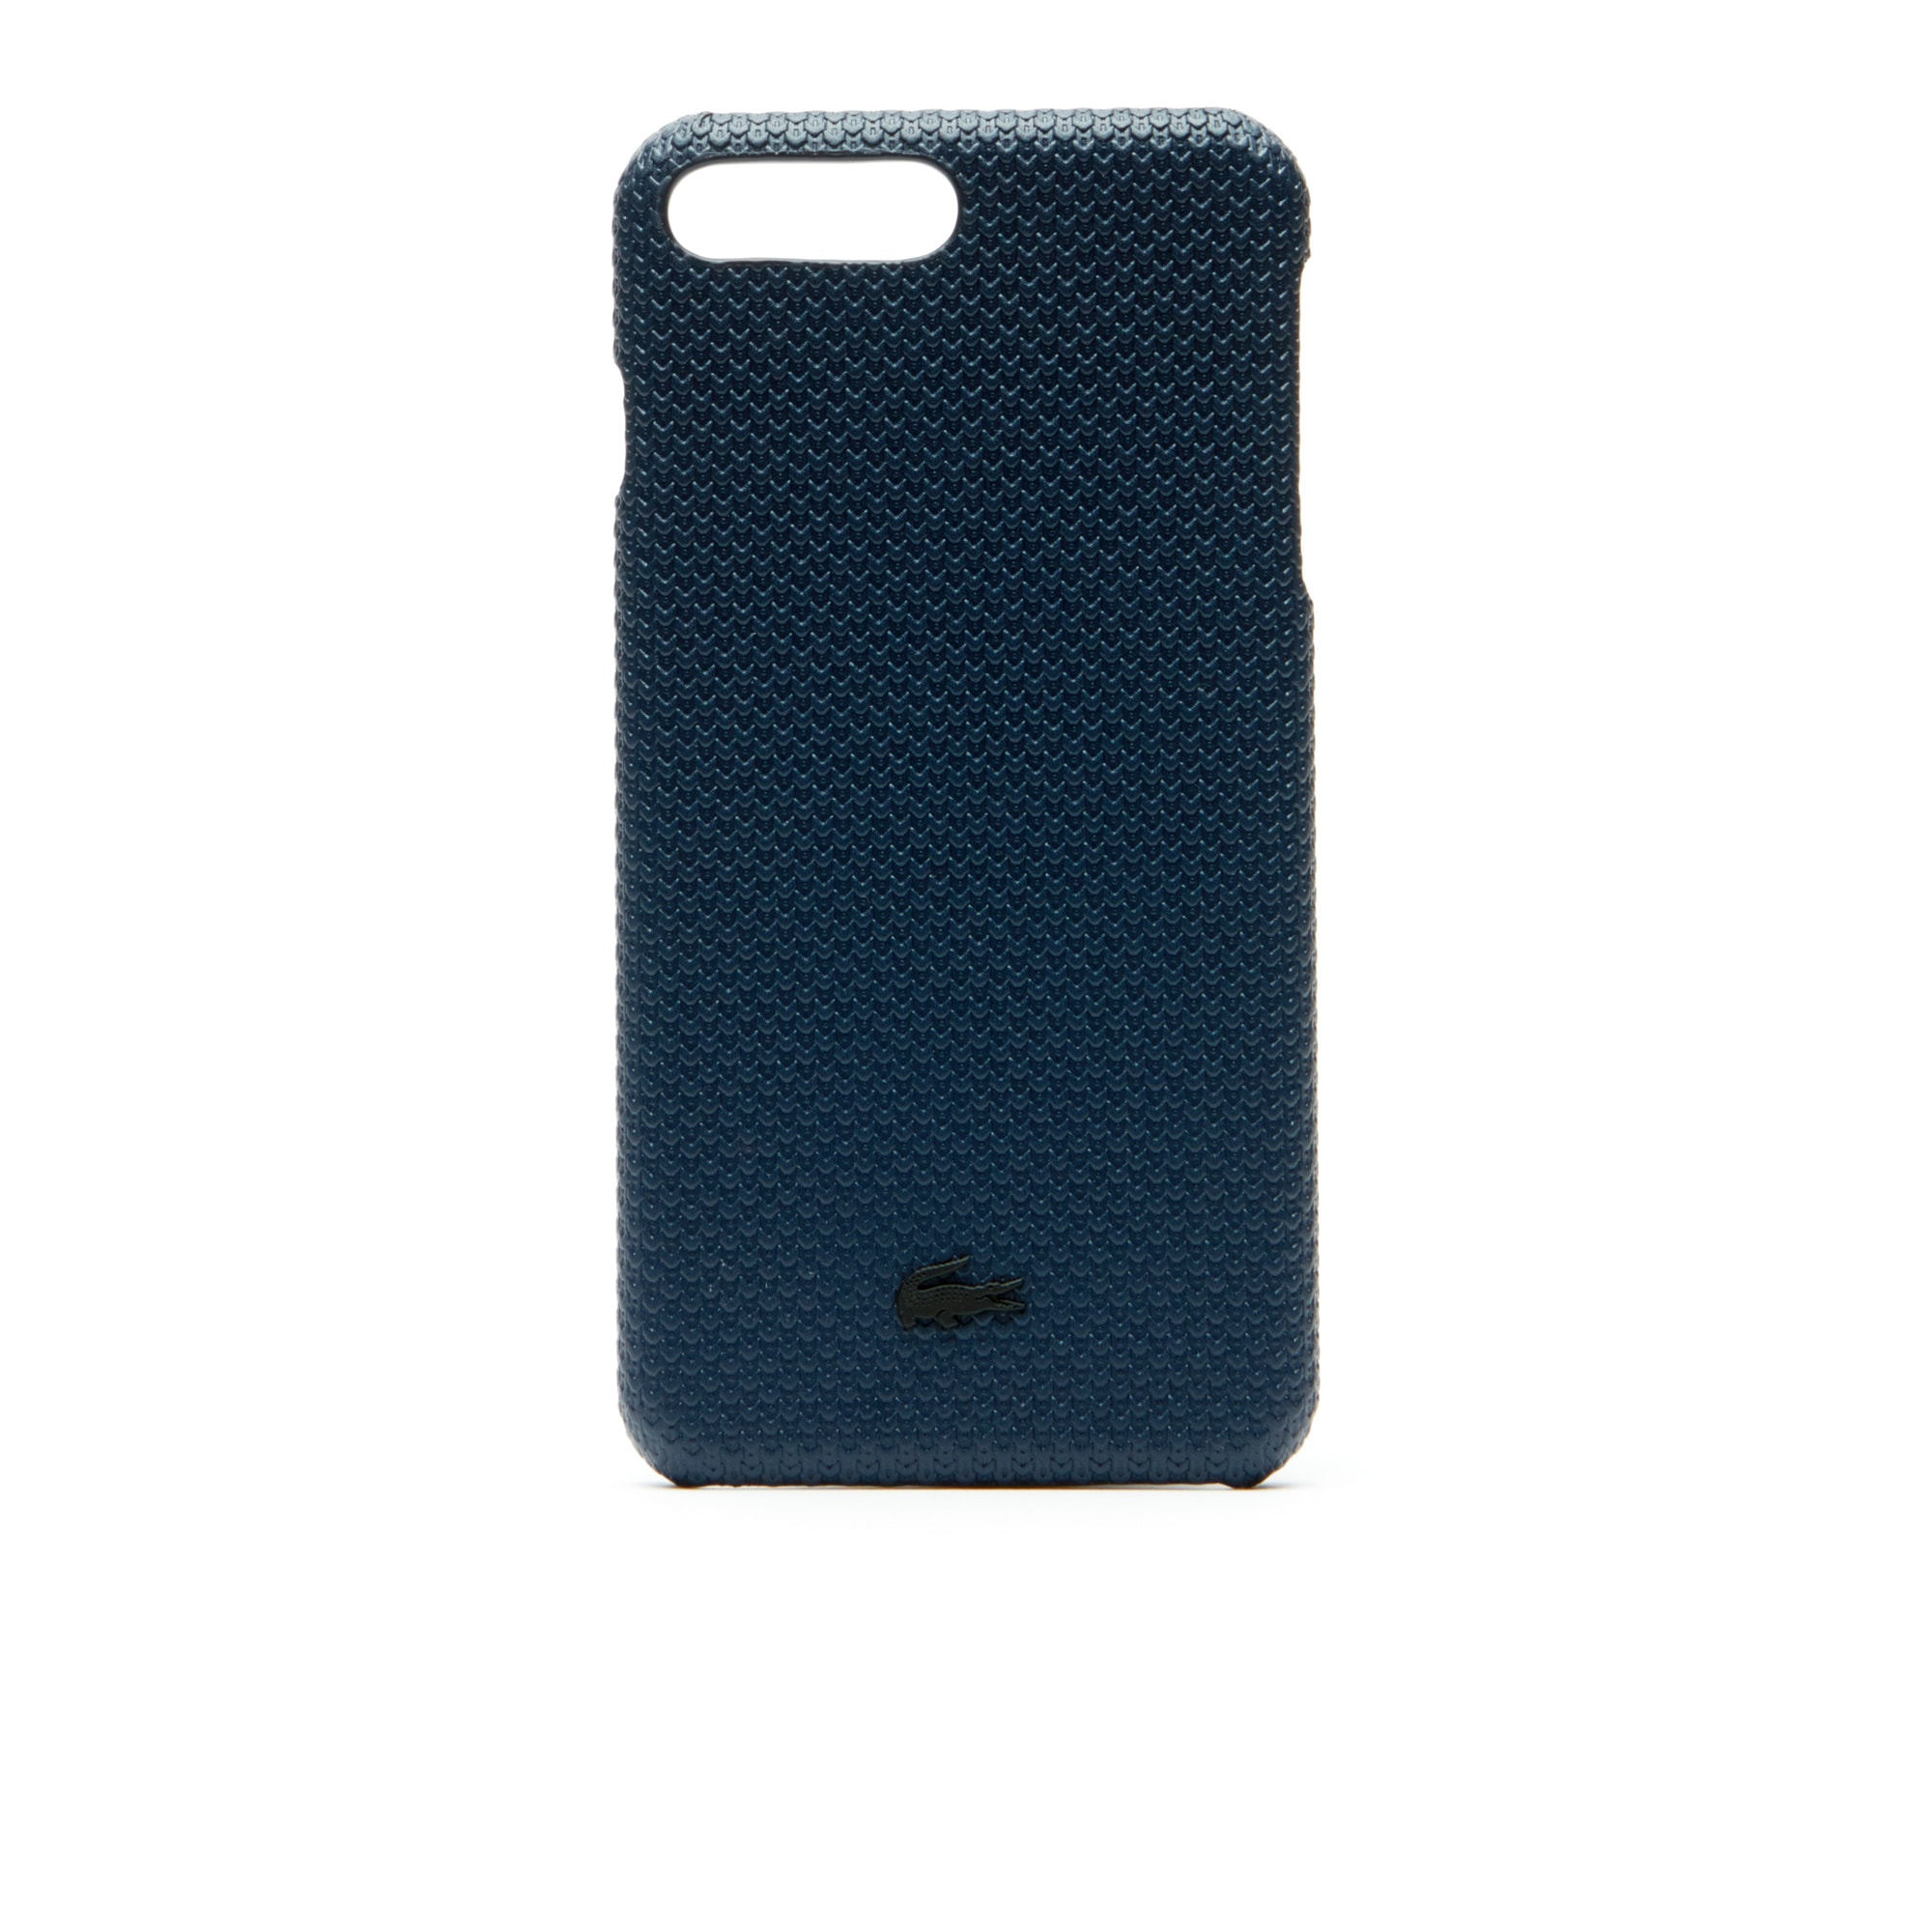 Herren iPhone 8+ Hülle CHANTACO aus mattem Piqué-Leder